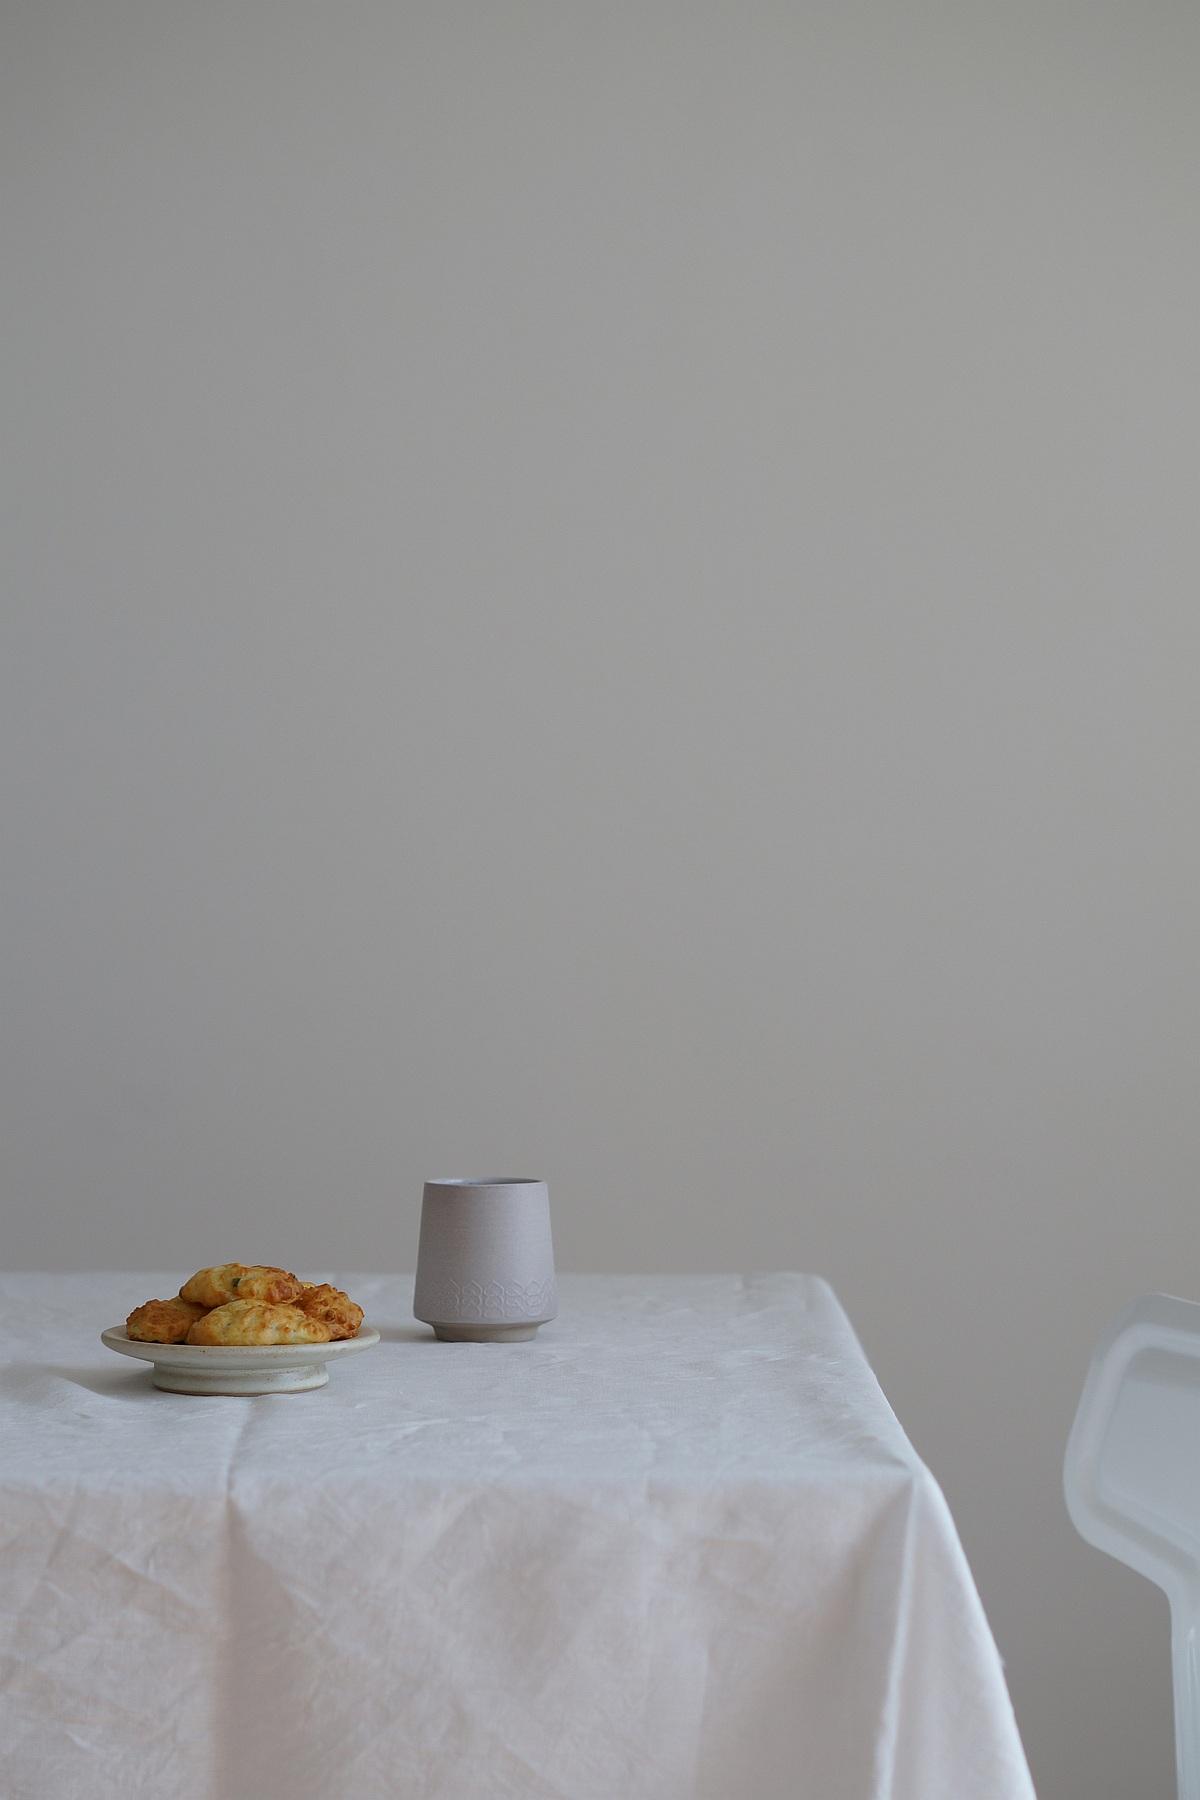 Kräuter-Käse-Scones   Foto: Sabine Wittig